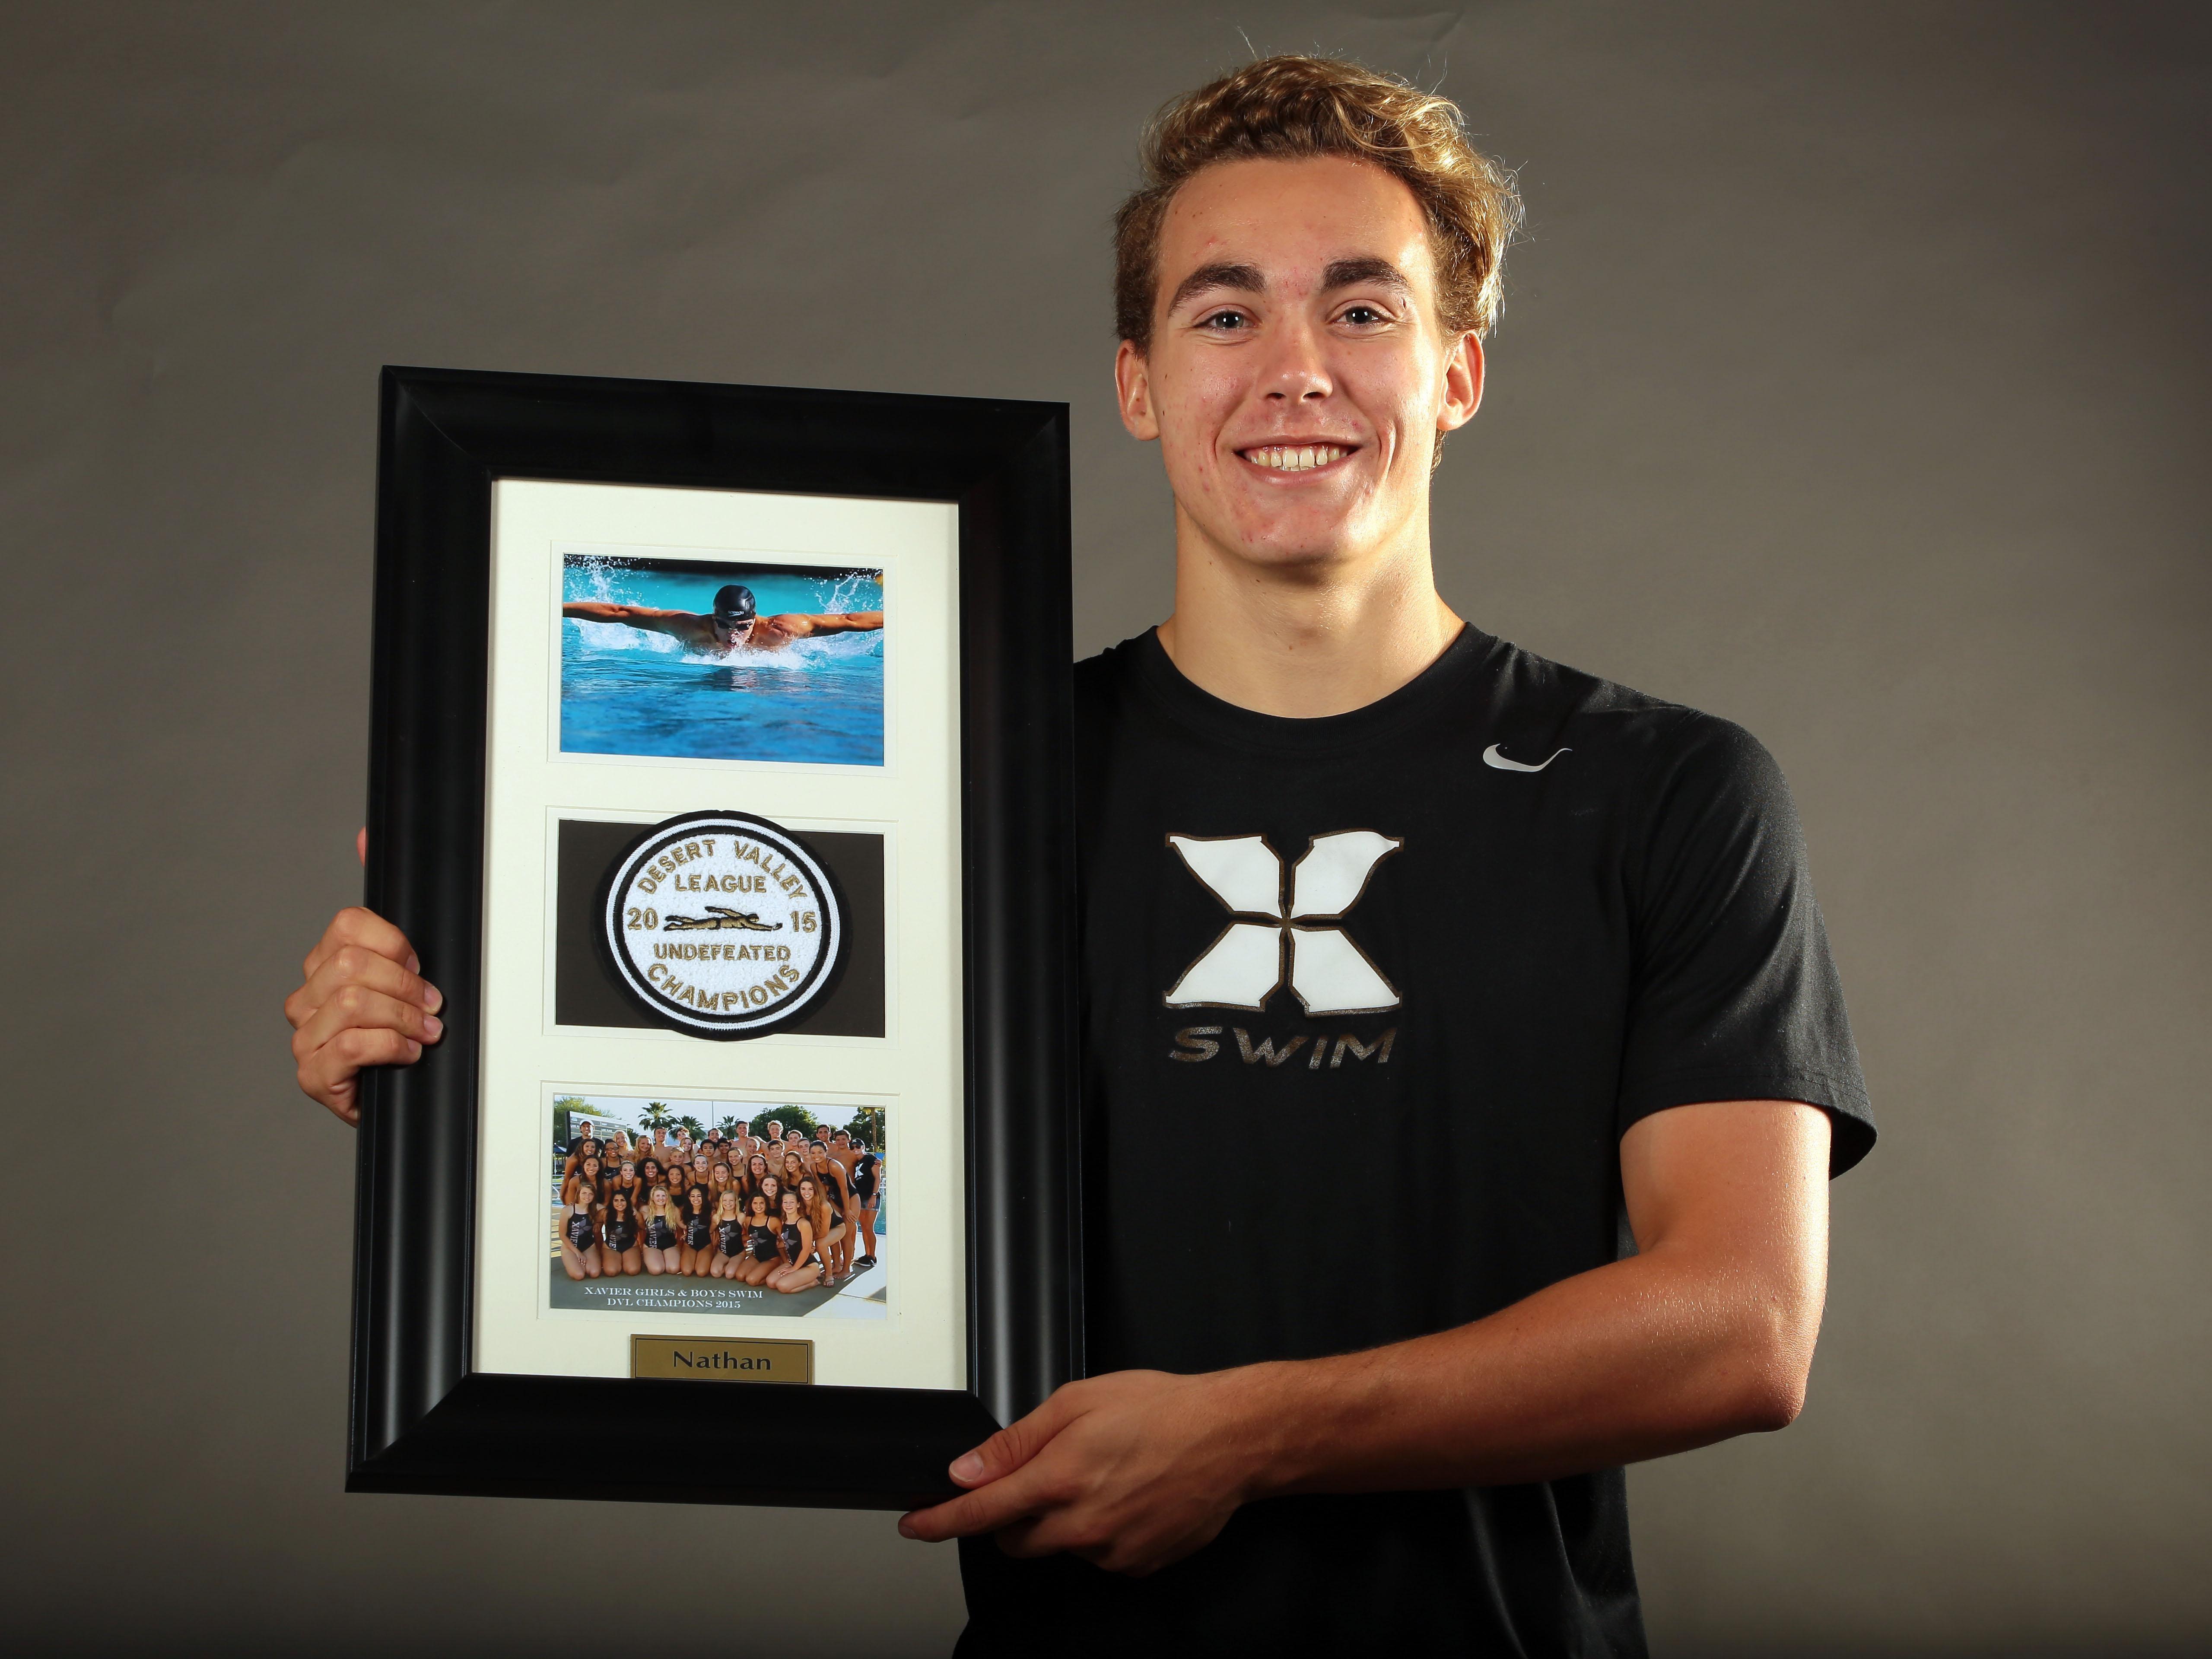 Xavier College Prep. swim star Nathan Salmon on Wednesday, at the Desert Sun Studio in Palm Springs.